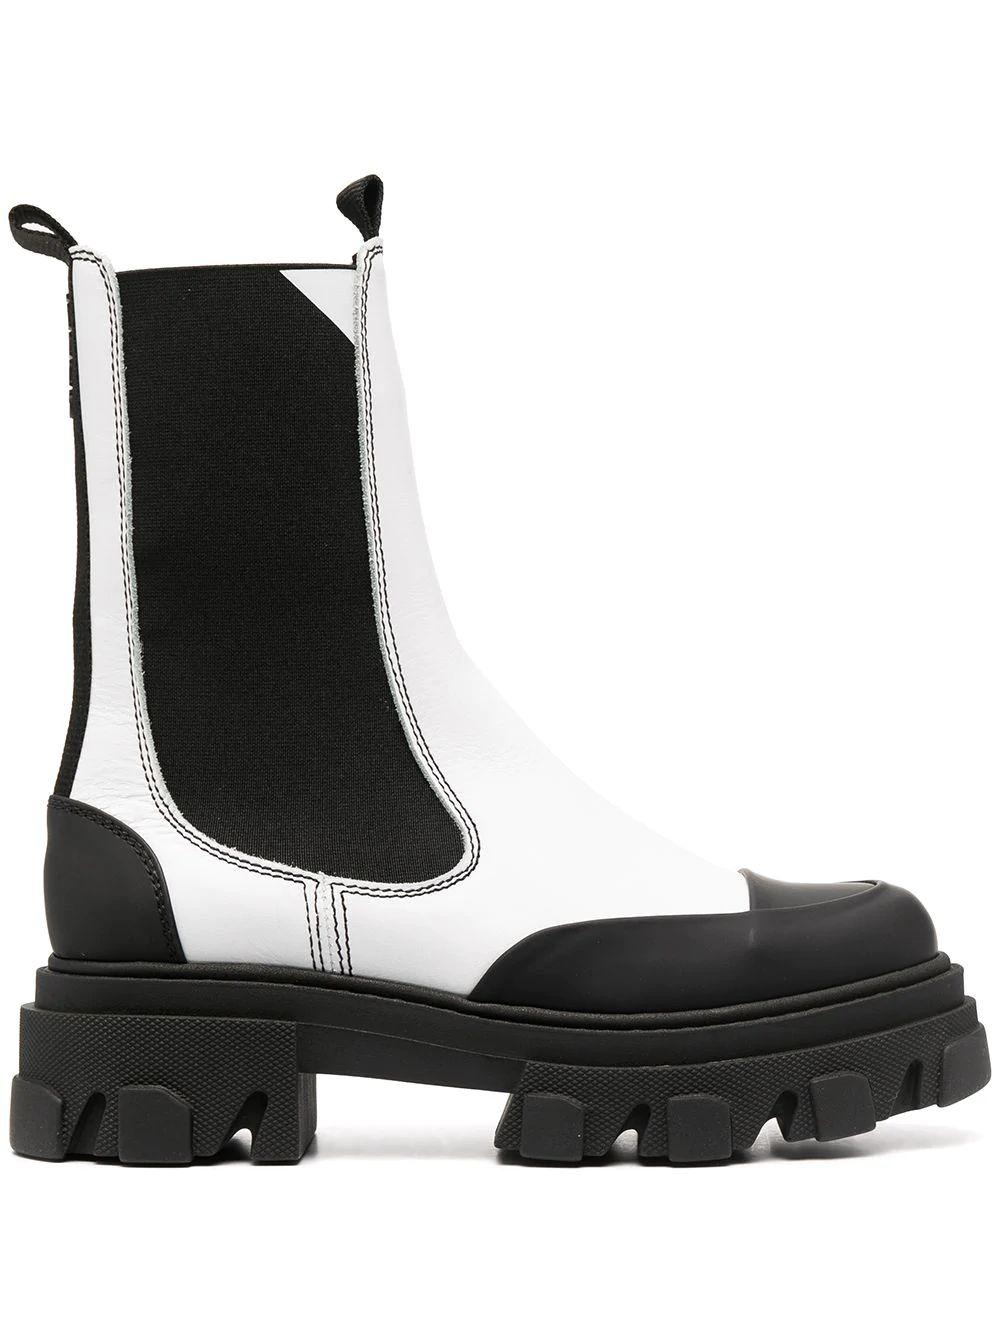 Mid- Calf Chelsea Boot Item # S1416